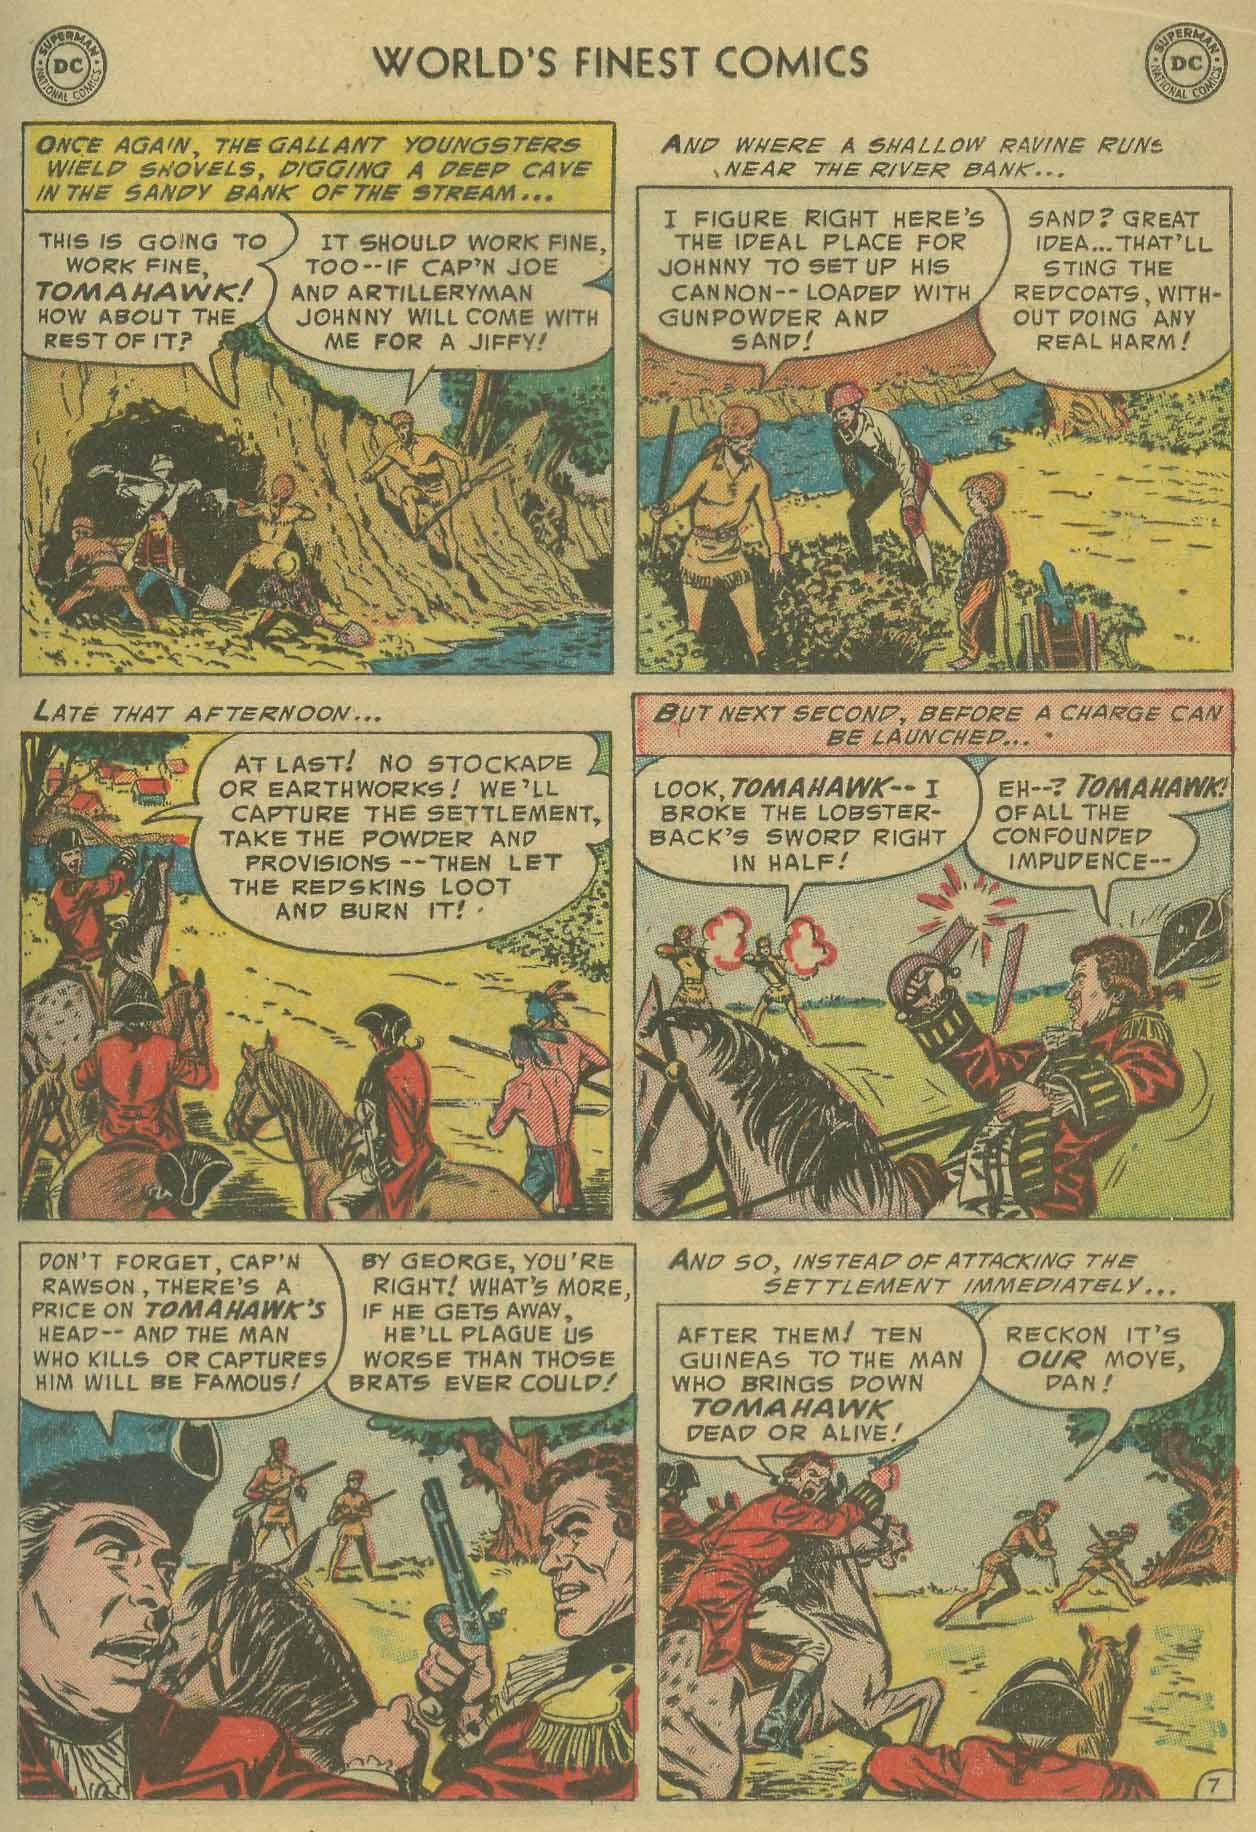 Read online World's Finest Comics comic -  Issue #69 - 23